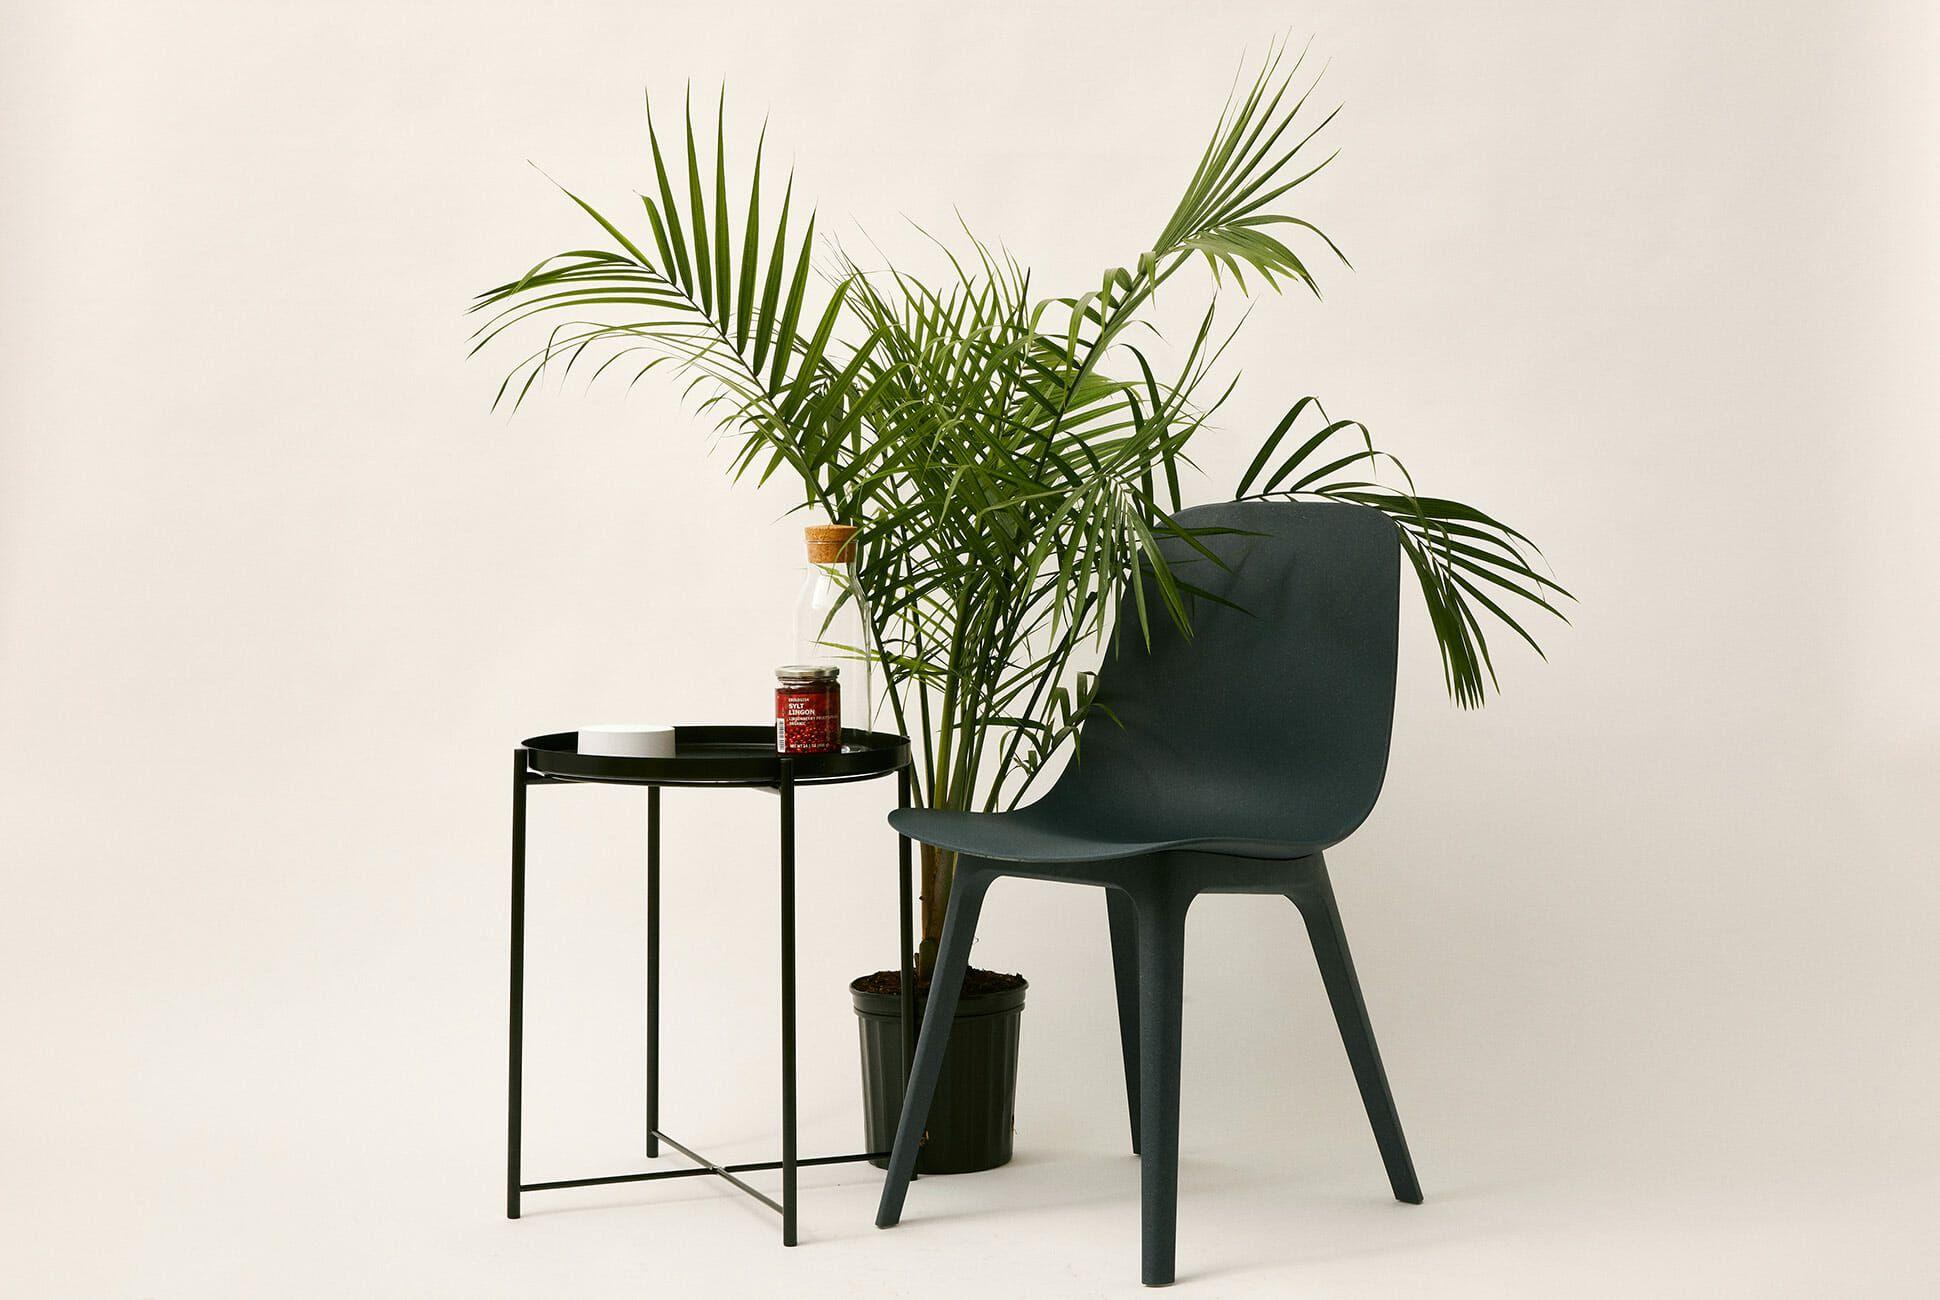 Ikea Favorites For 2020 Apartment Decorating 2